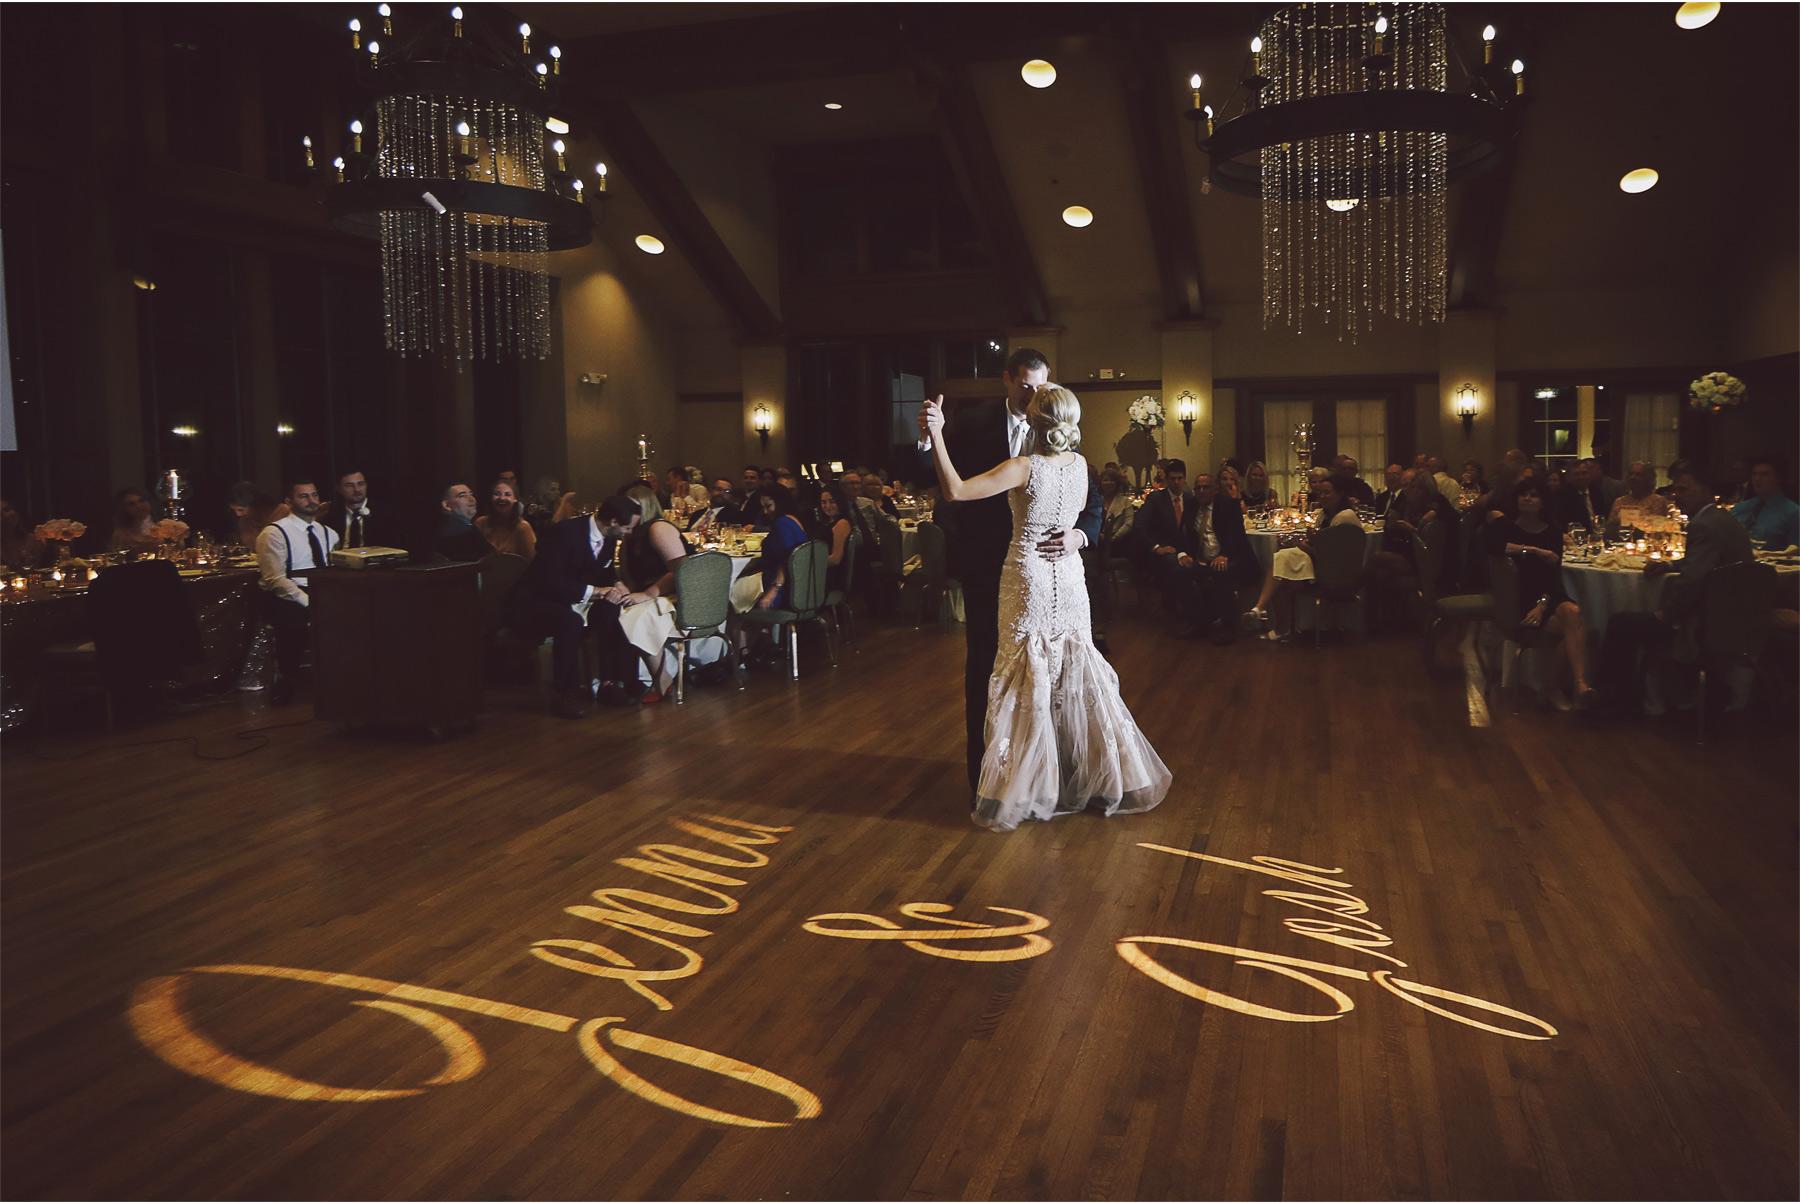 22-Minneapolis-Minnesota-Wedding-Photography-by-Vick-Photography-Golf-Course-Interlachen-Country-Club--Reception-First-Dance-Jenna-and-Josh.jpg